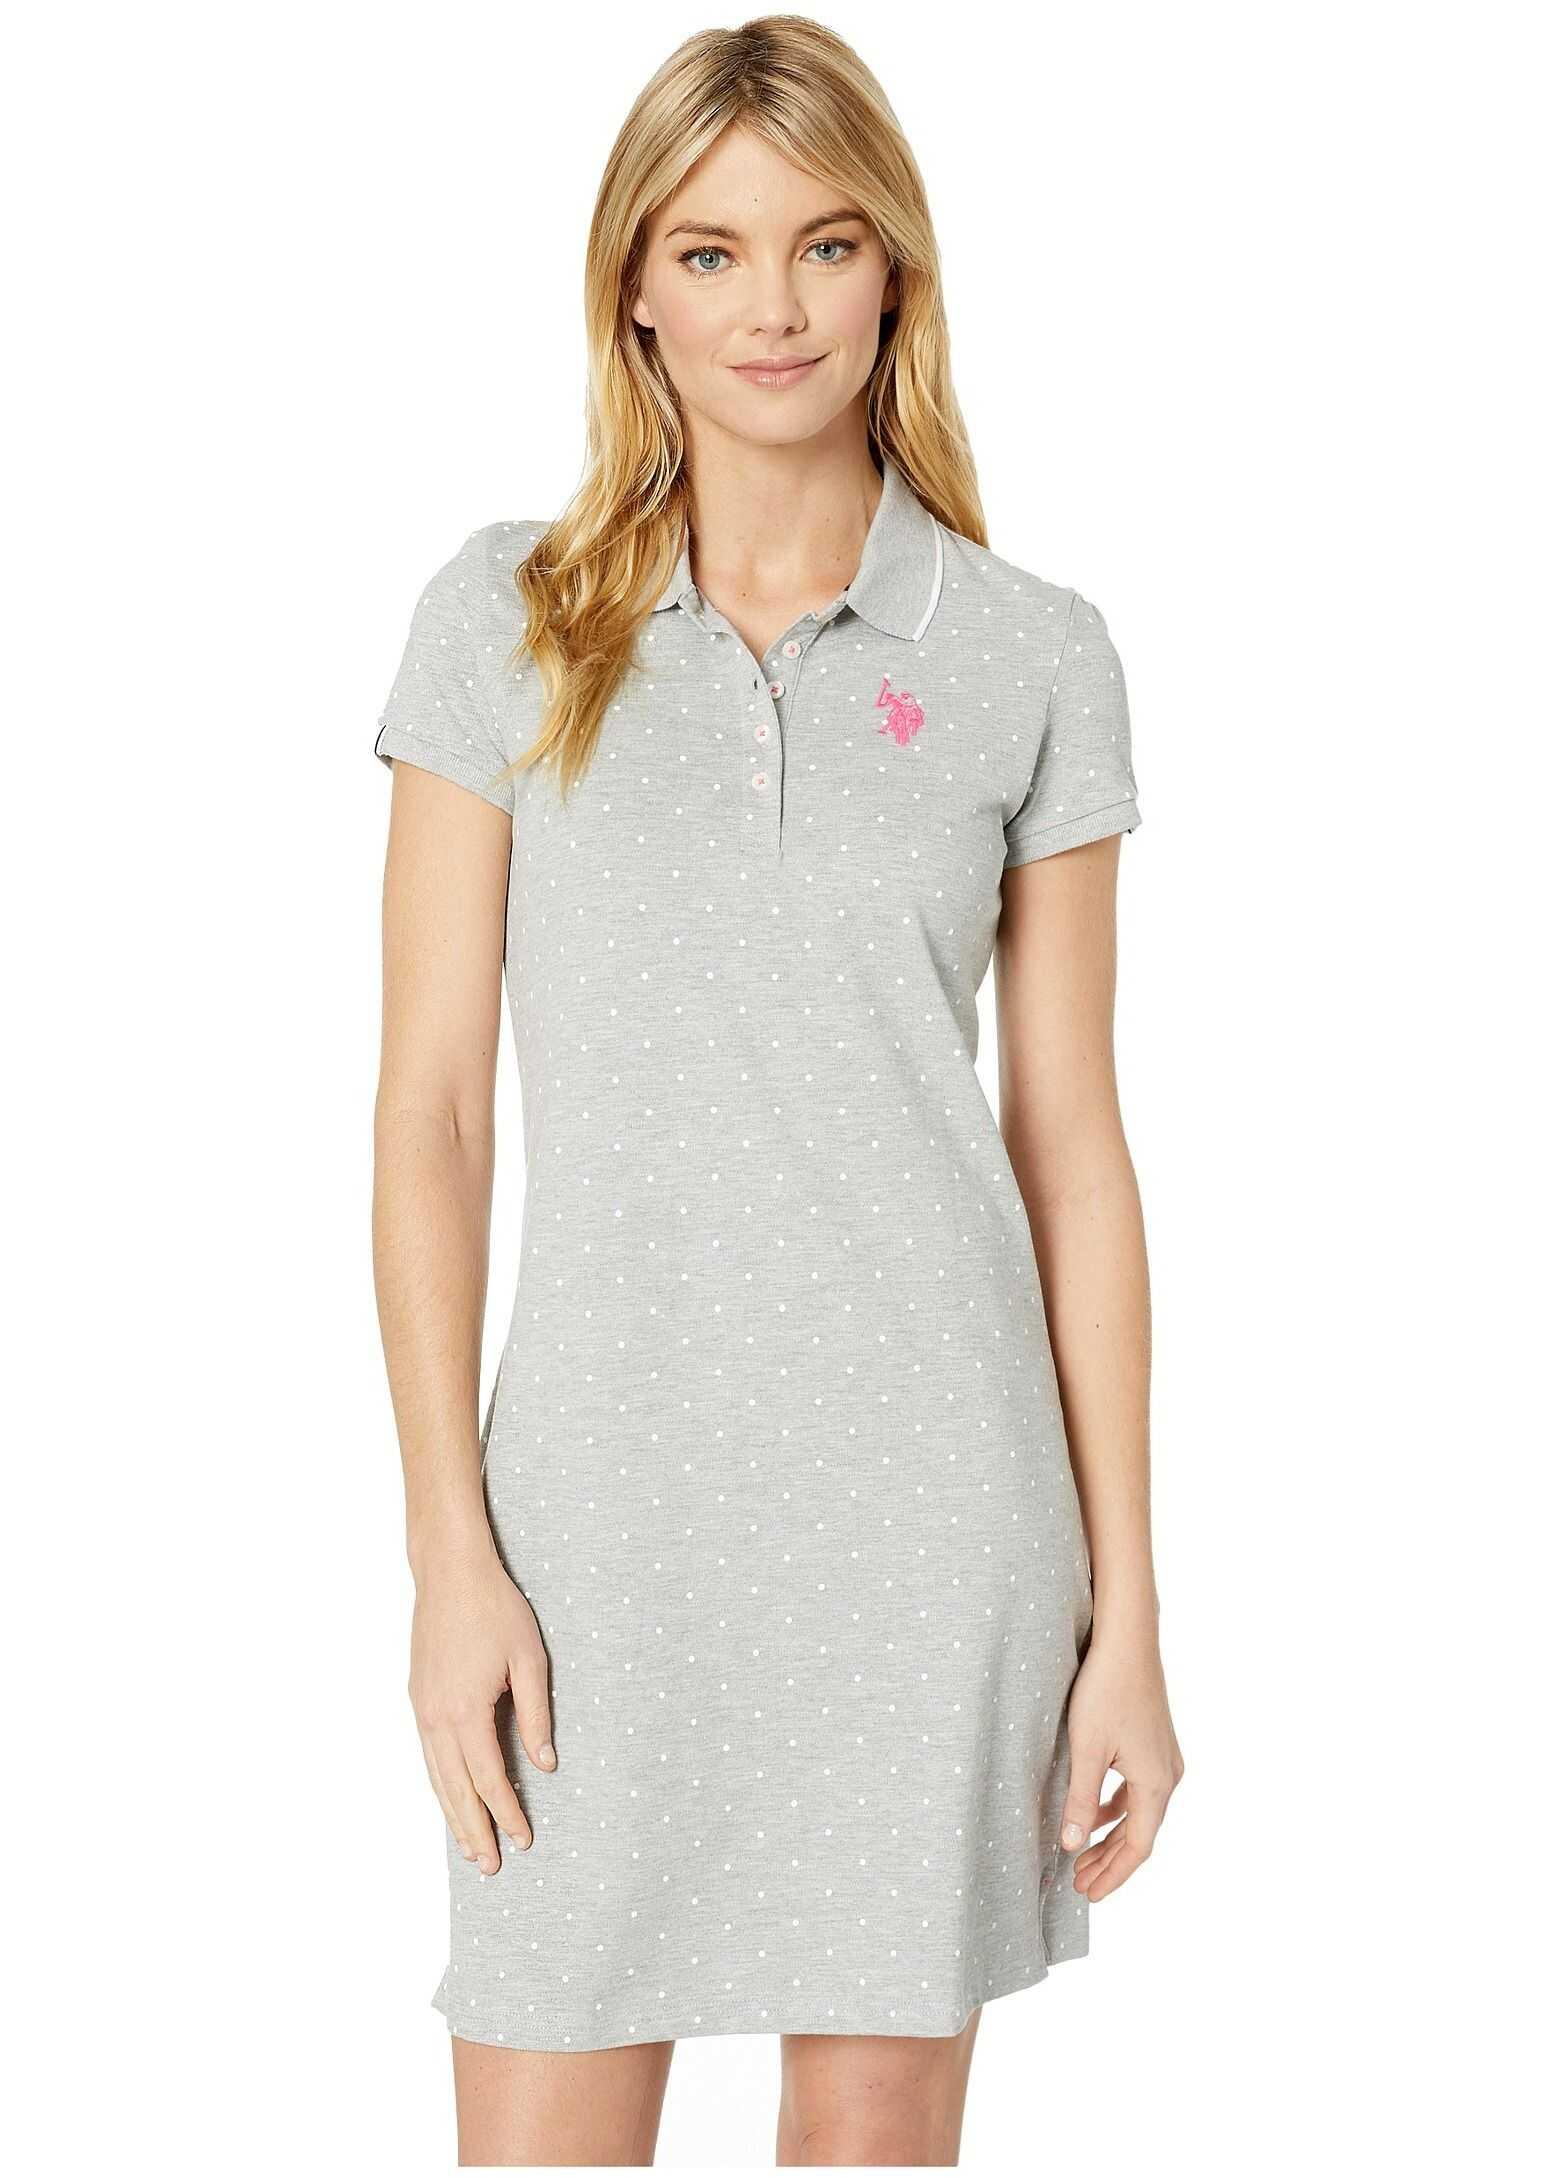 U.S. POLO ASSN. Dot Polo Dress Heather Grey